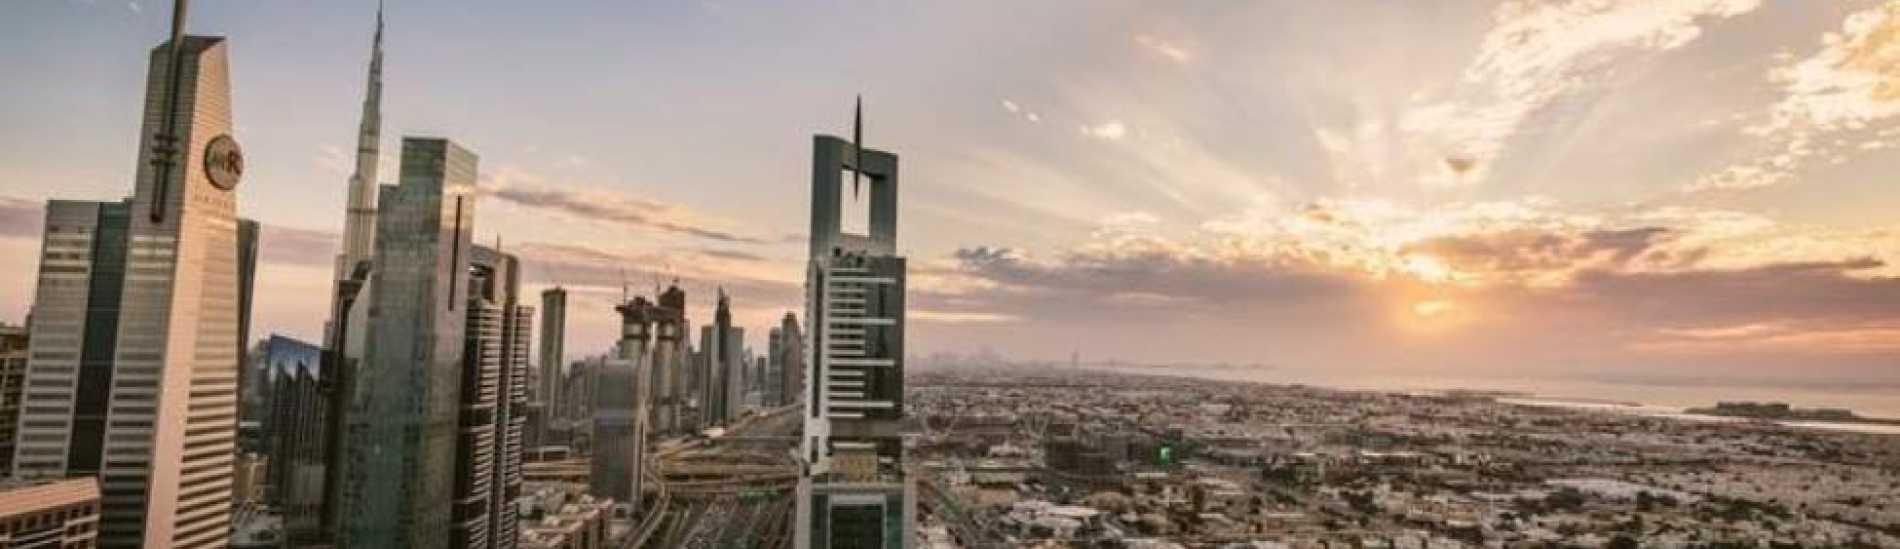 Khaleej Times - Dubai's new visa rule will promote long-term investment